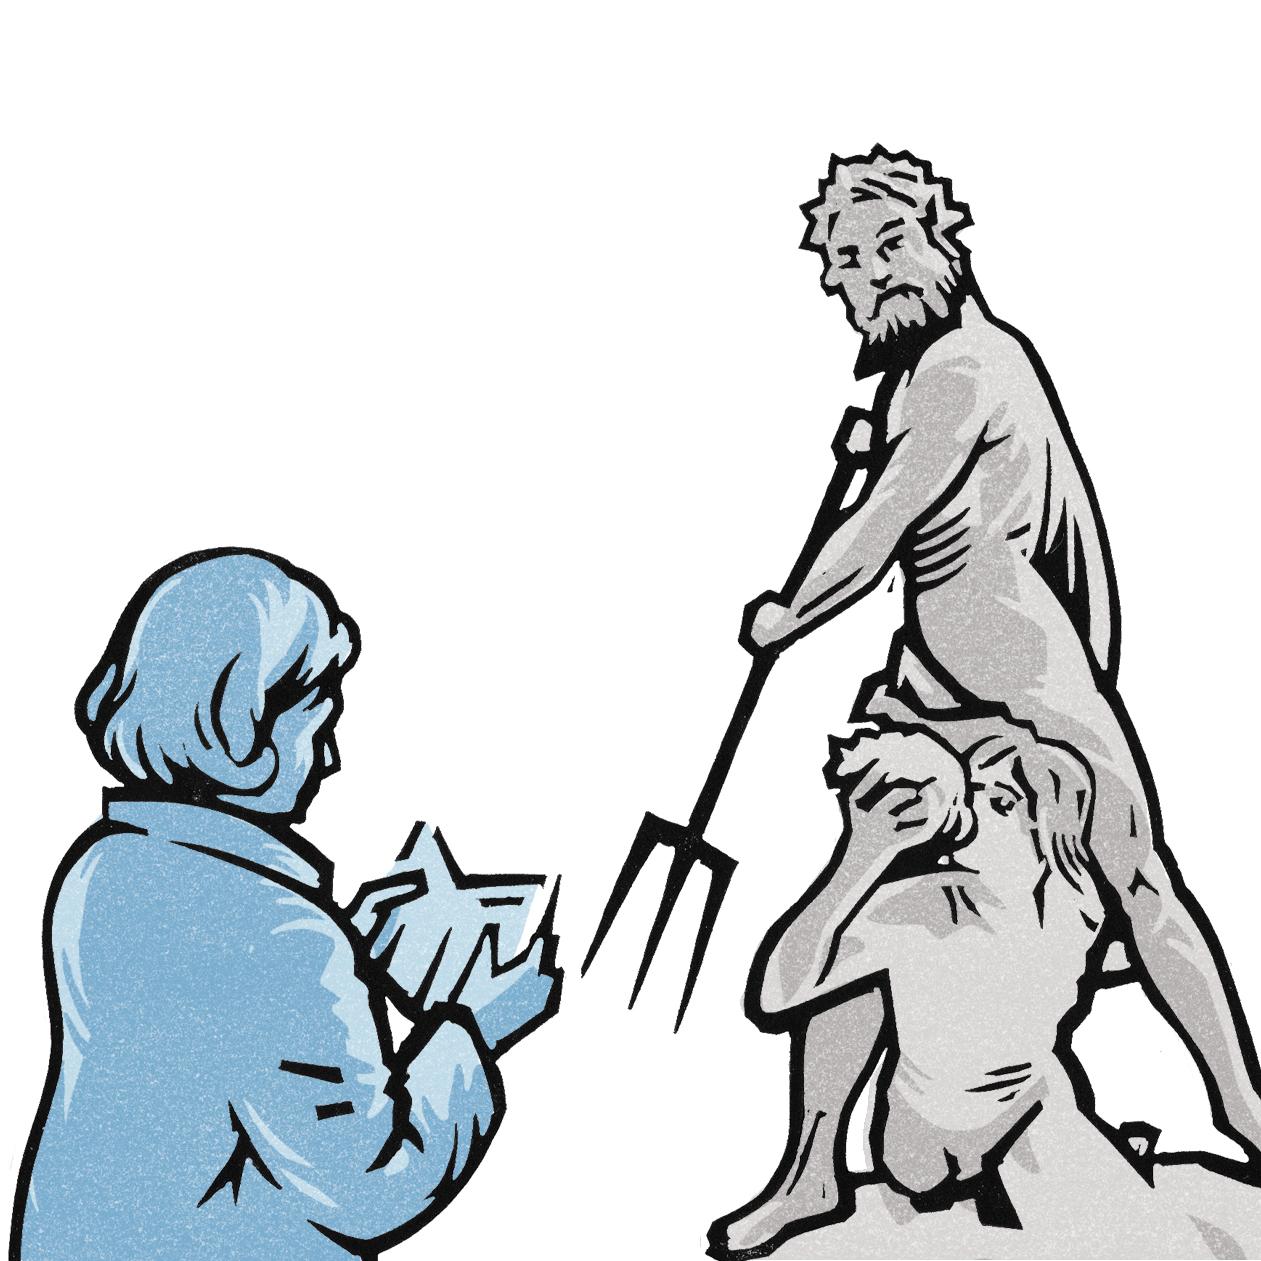 linocut illustration